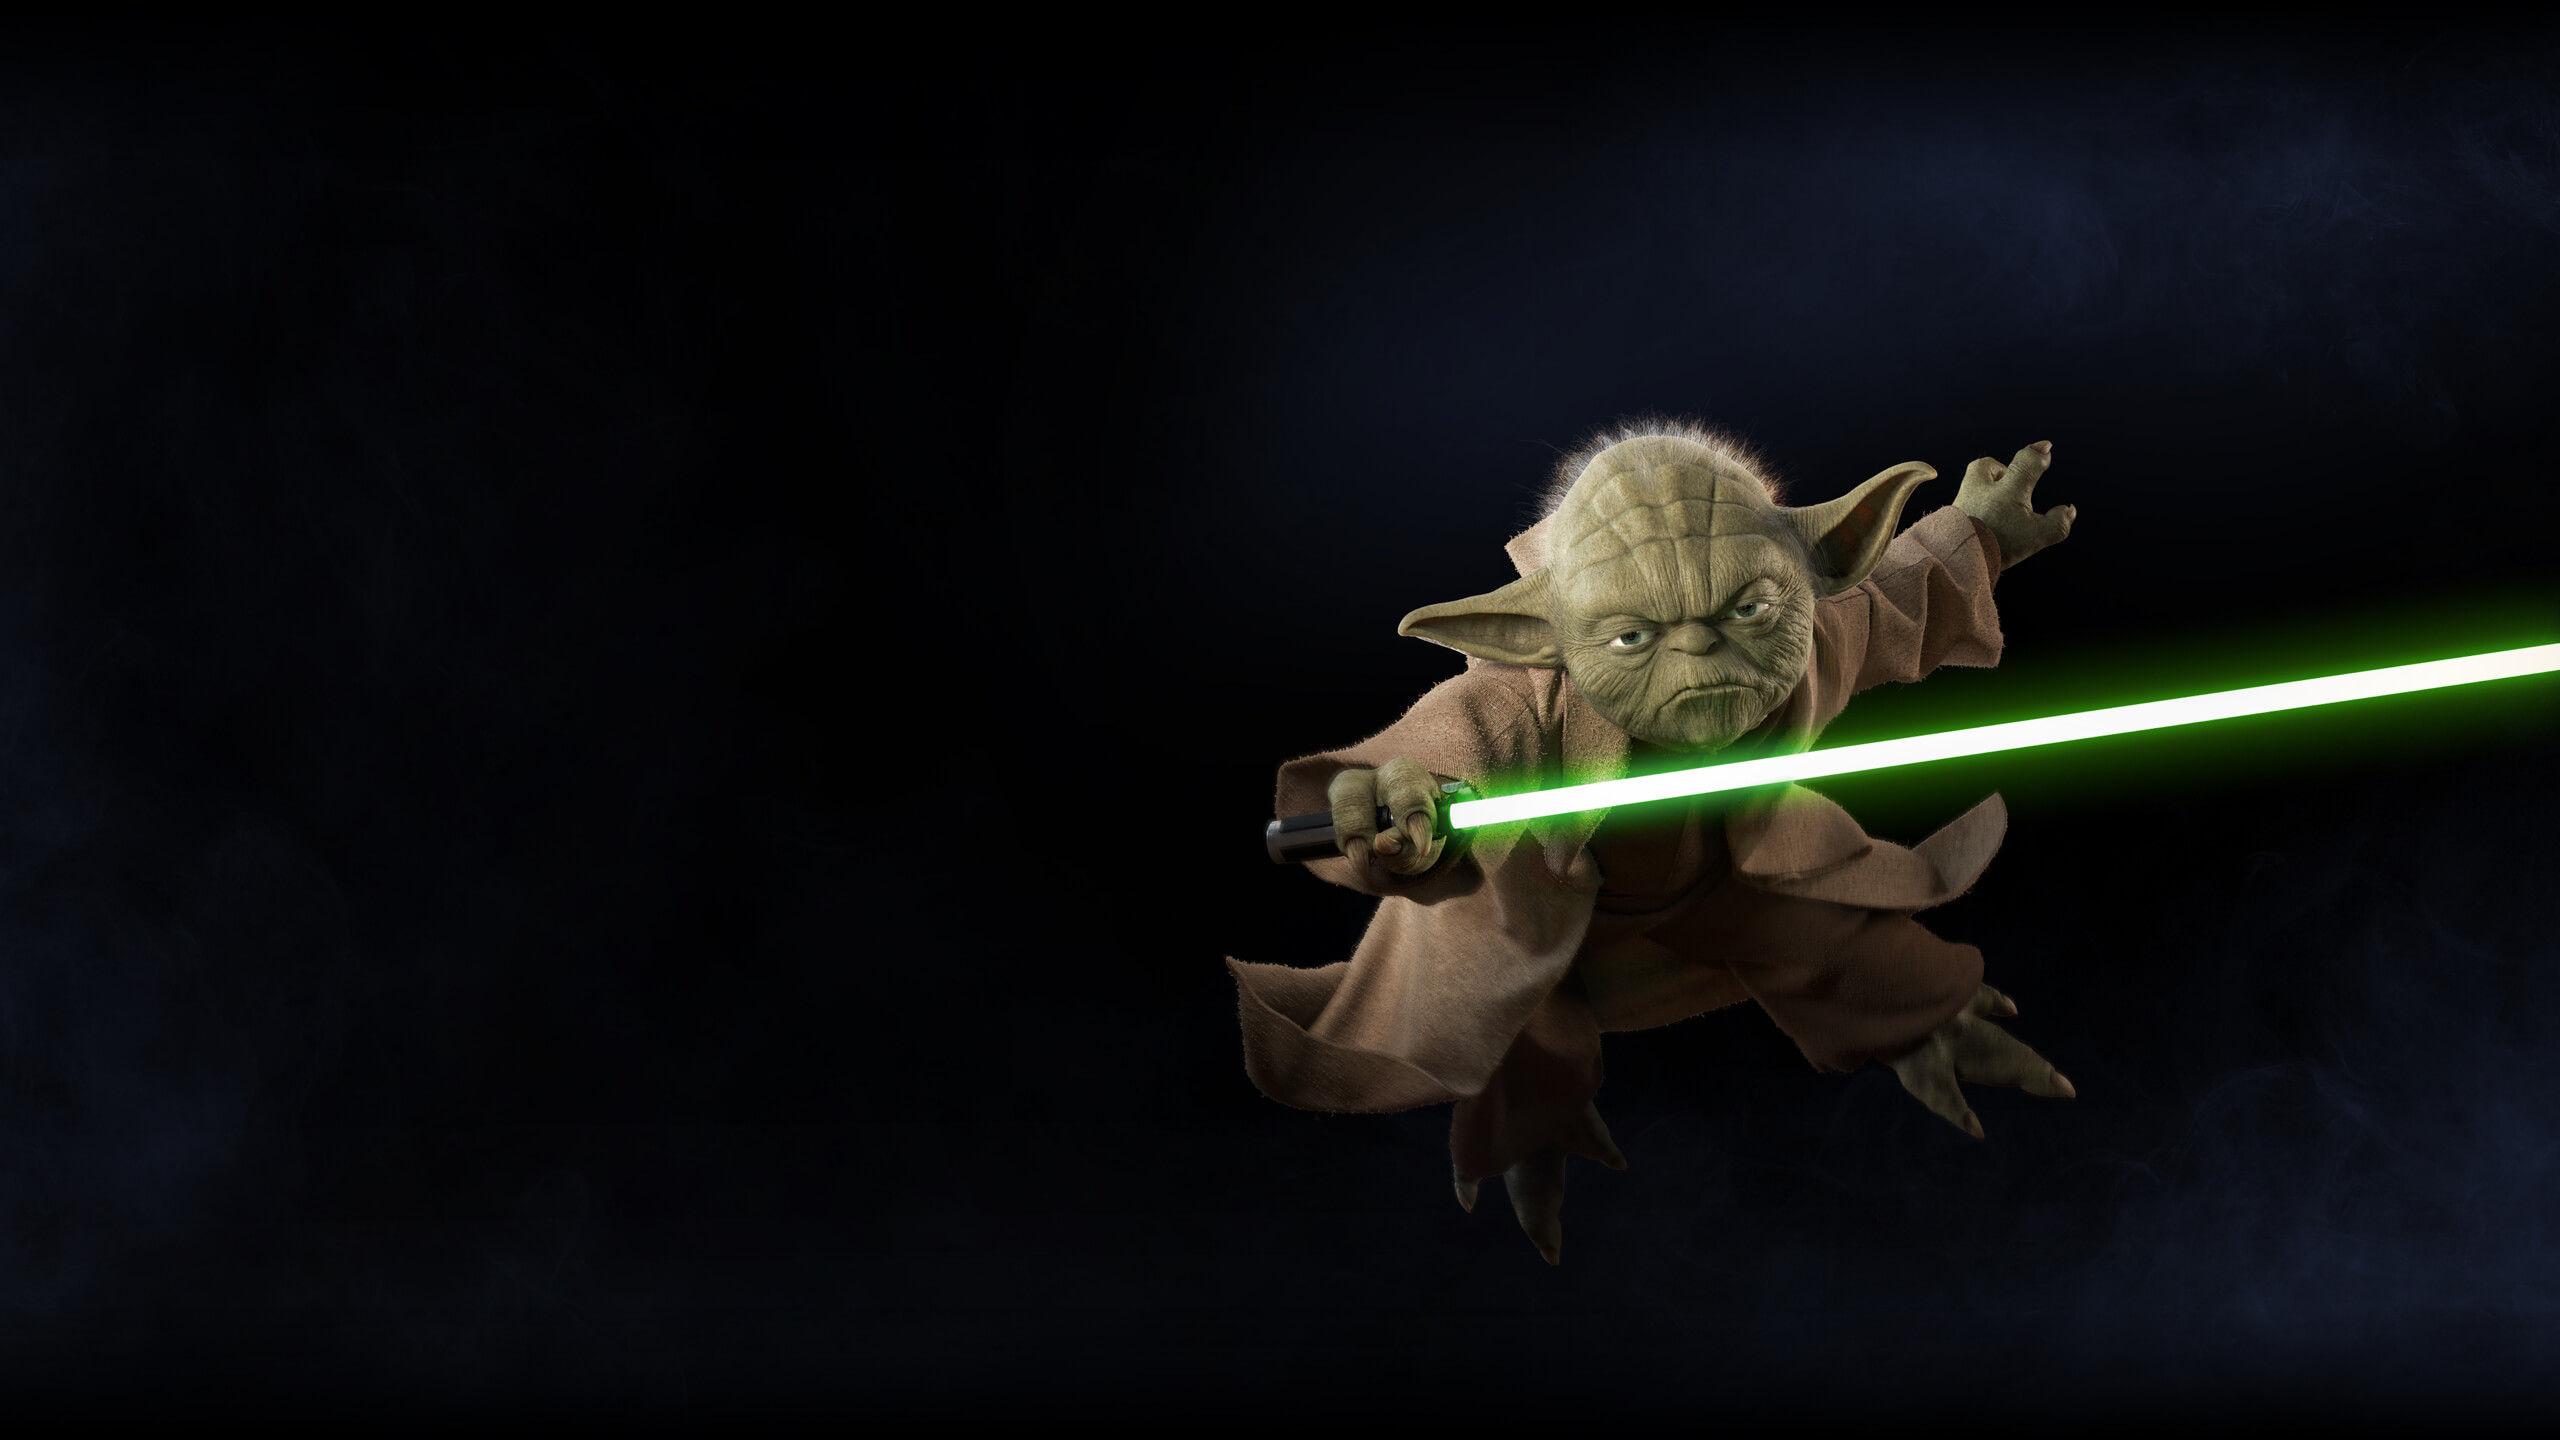 Yoda Star Wars Battlefront II, HD Games, 4k Wallpapers